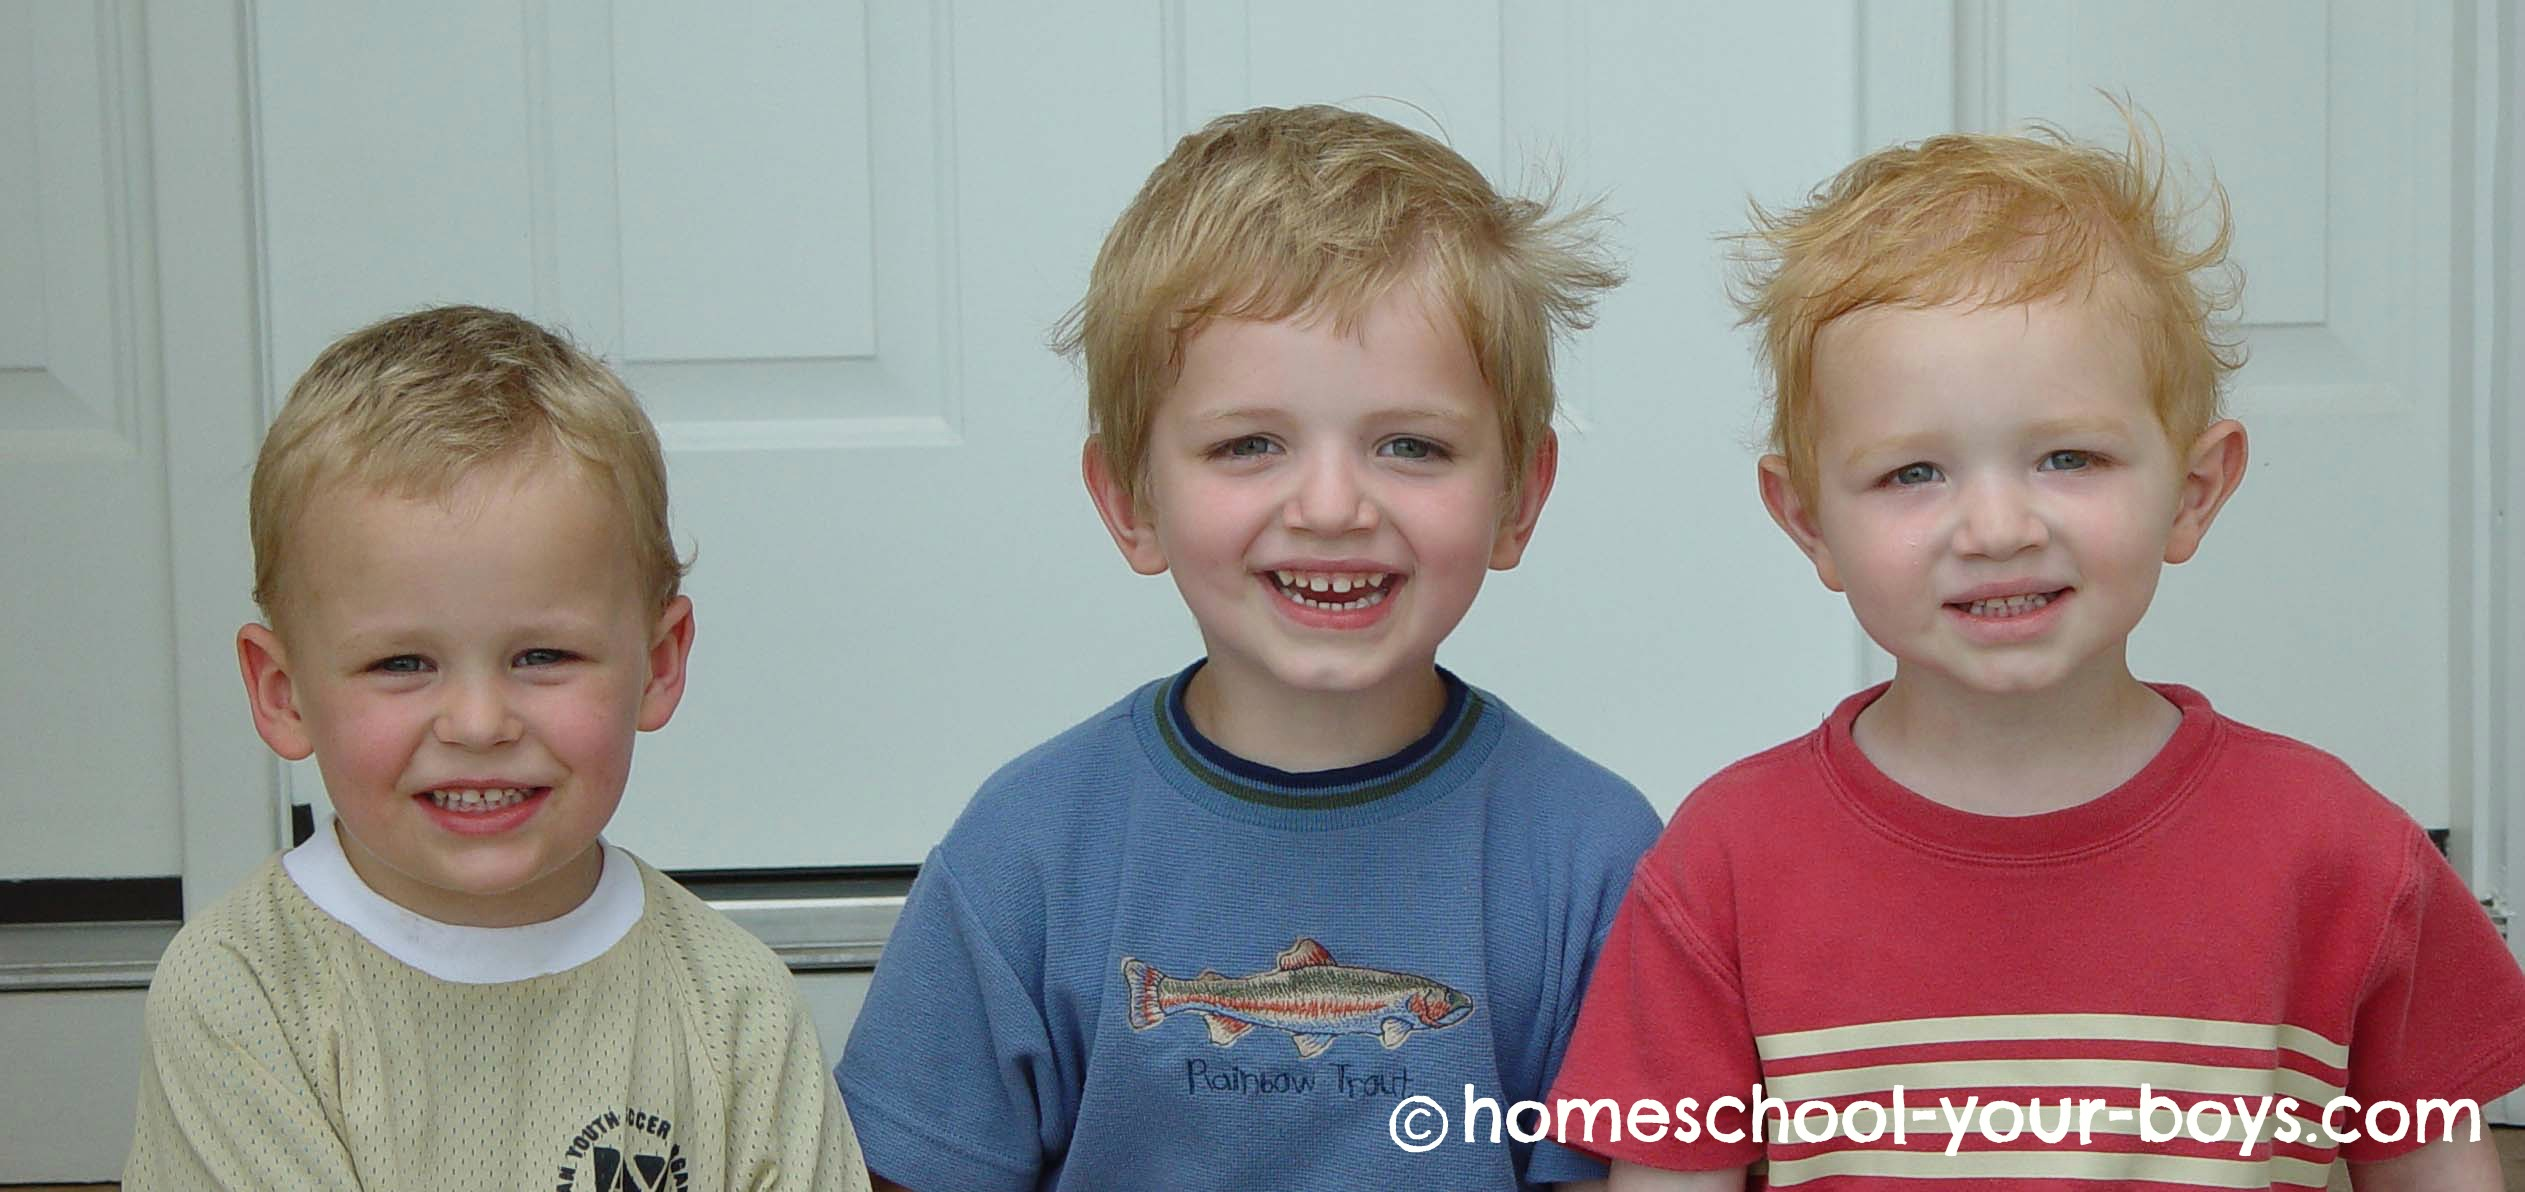 Can You Make Your Own Homeschool Preschool Curriculum?